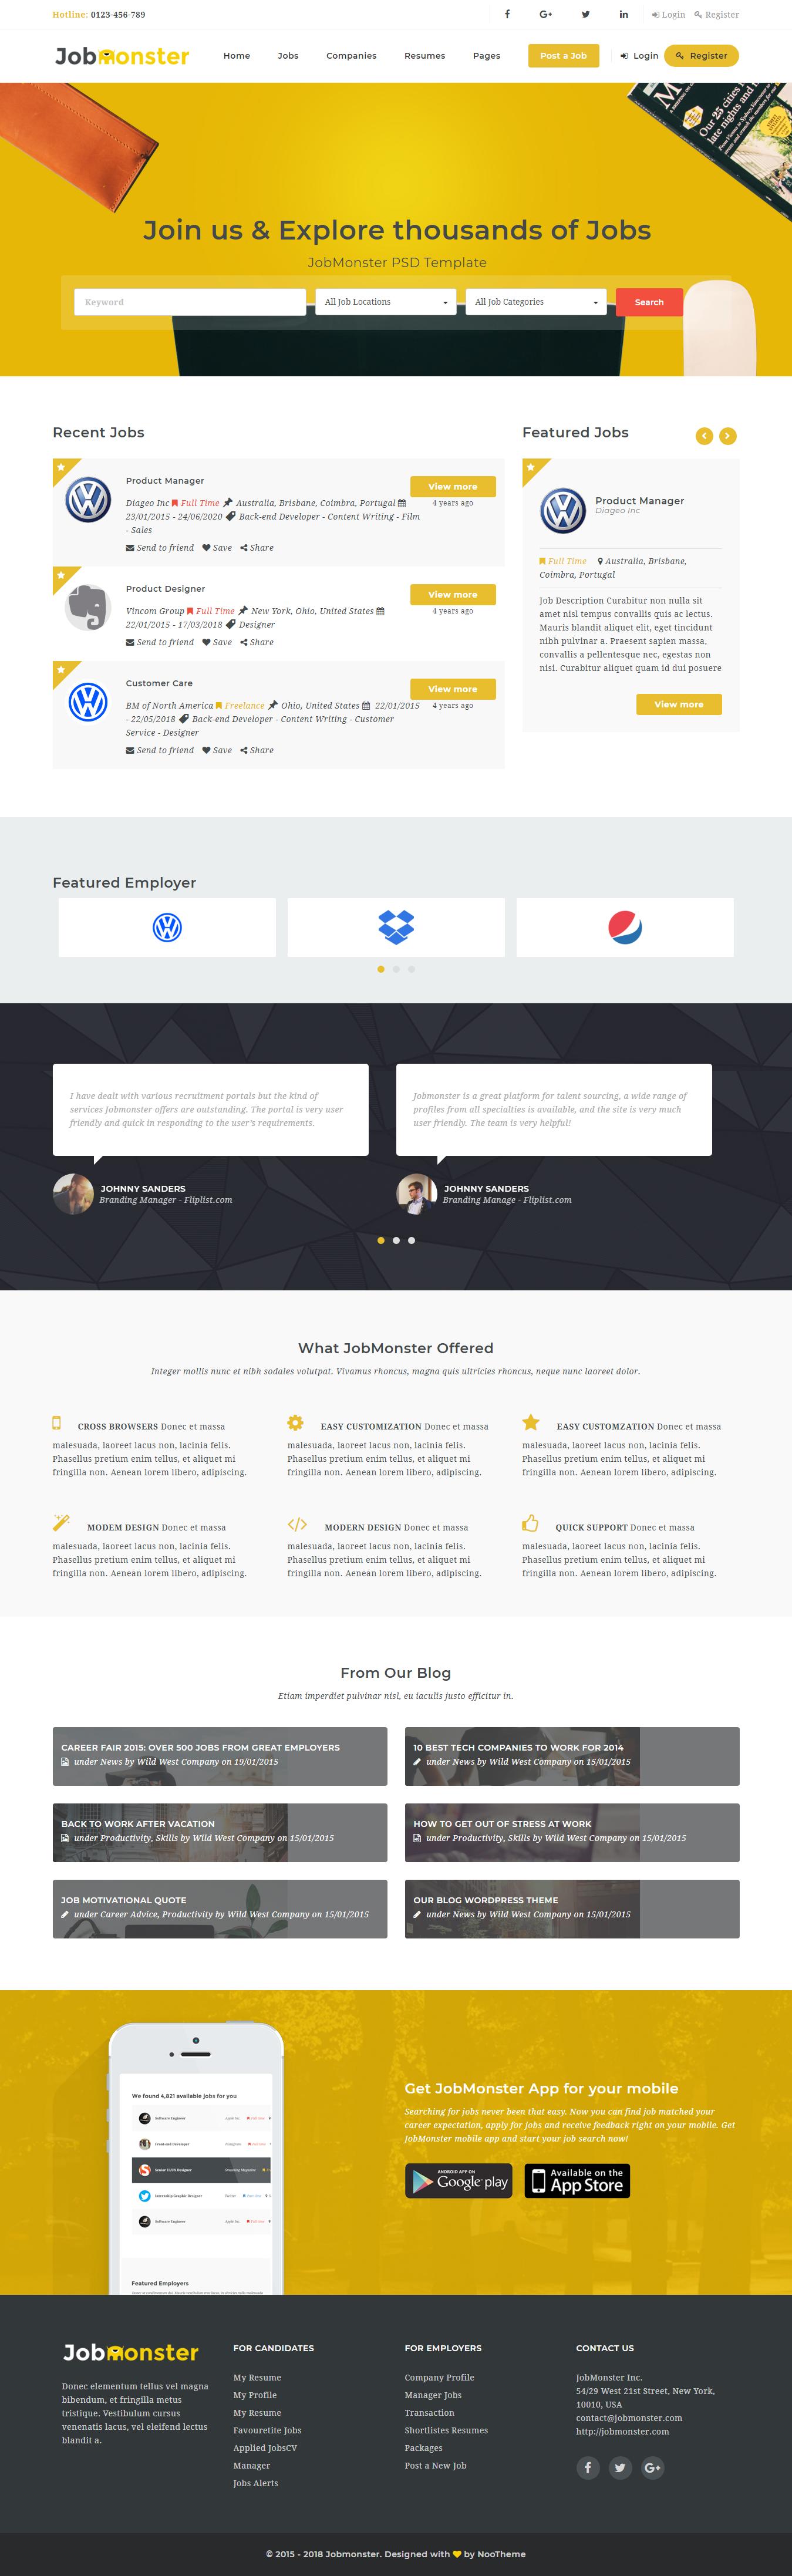 Jobmonster - Best Premium Job Board WordPress Theme